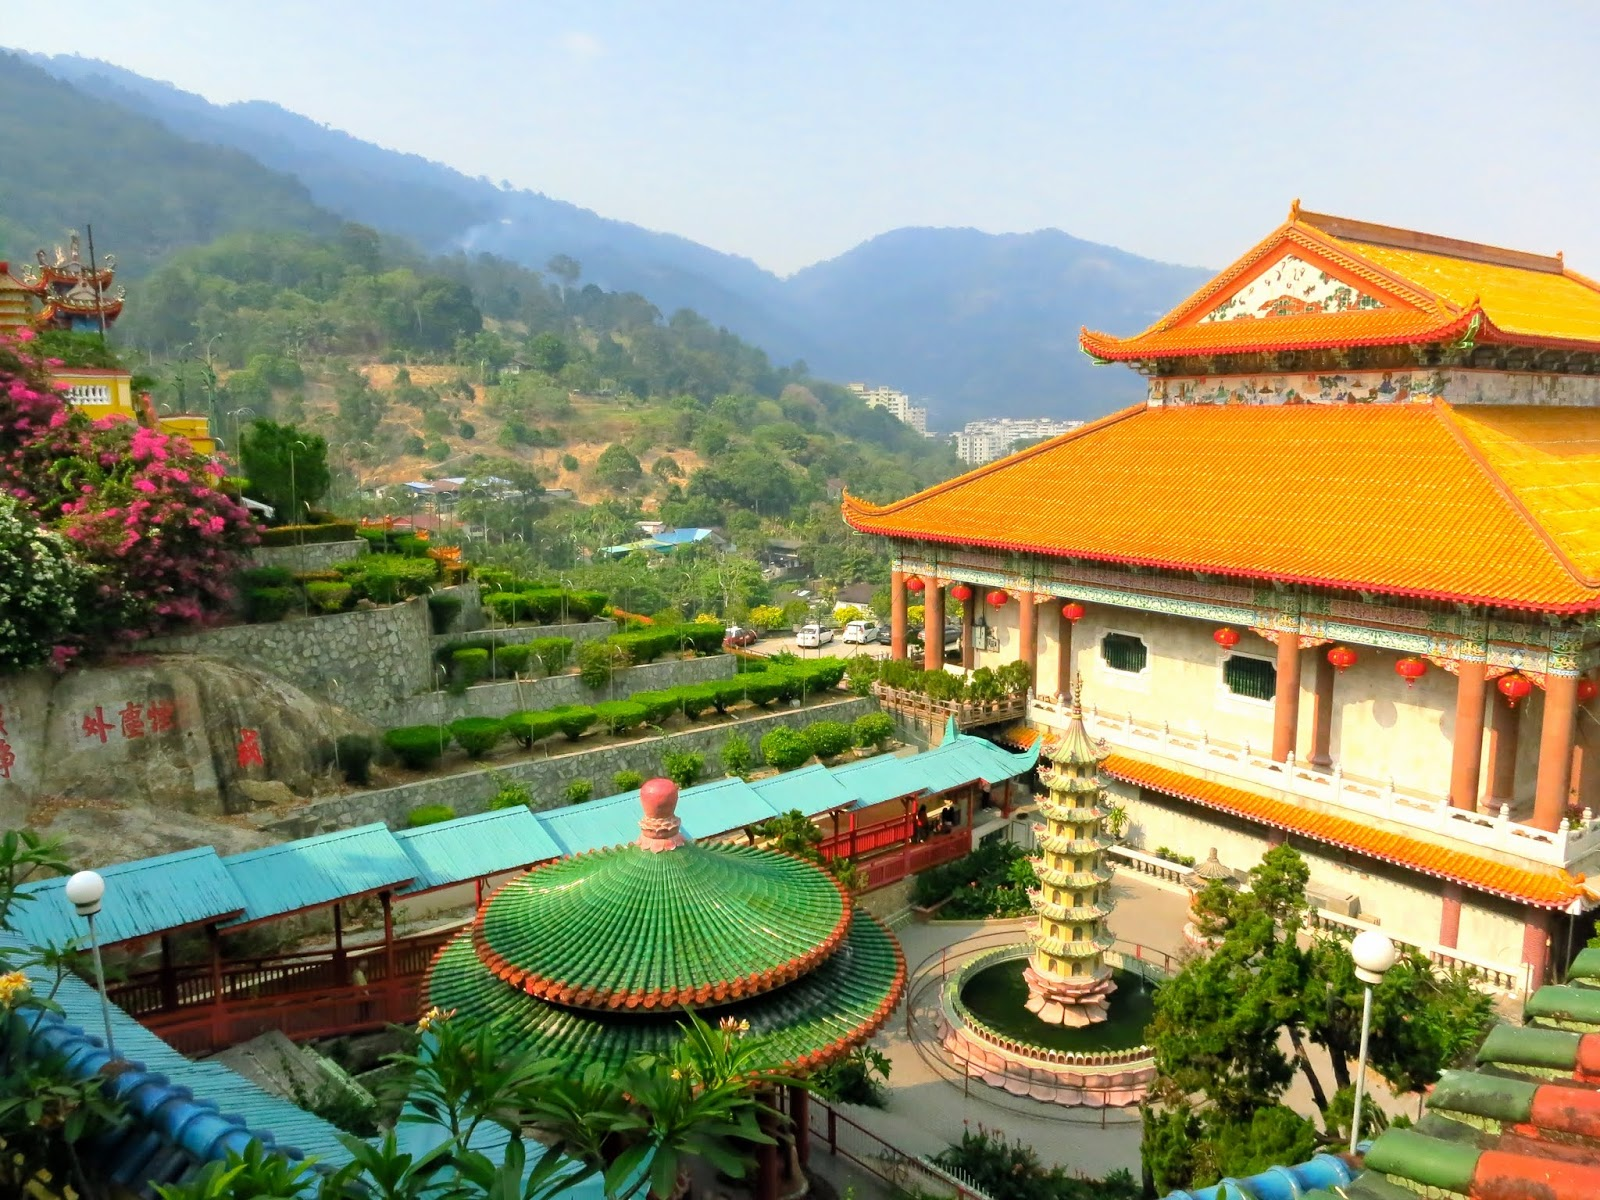 Kek Lok Si Temple in Penang Malaysia